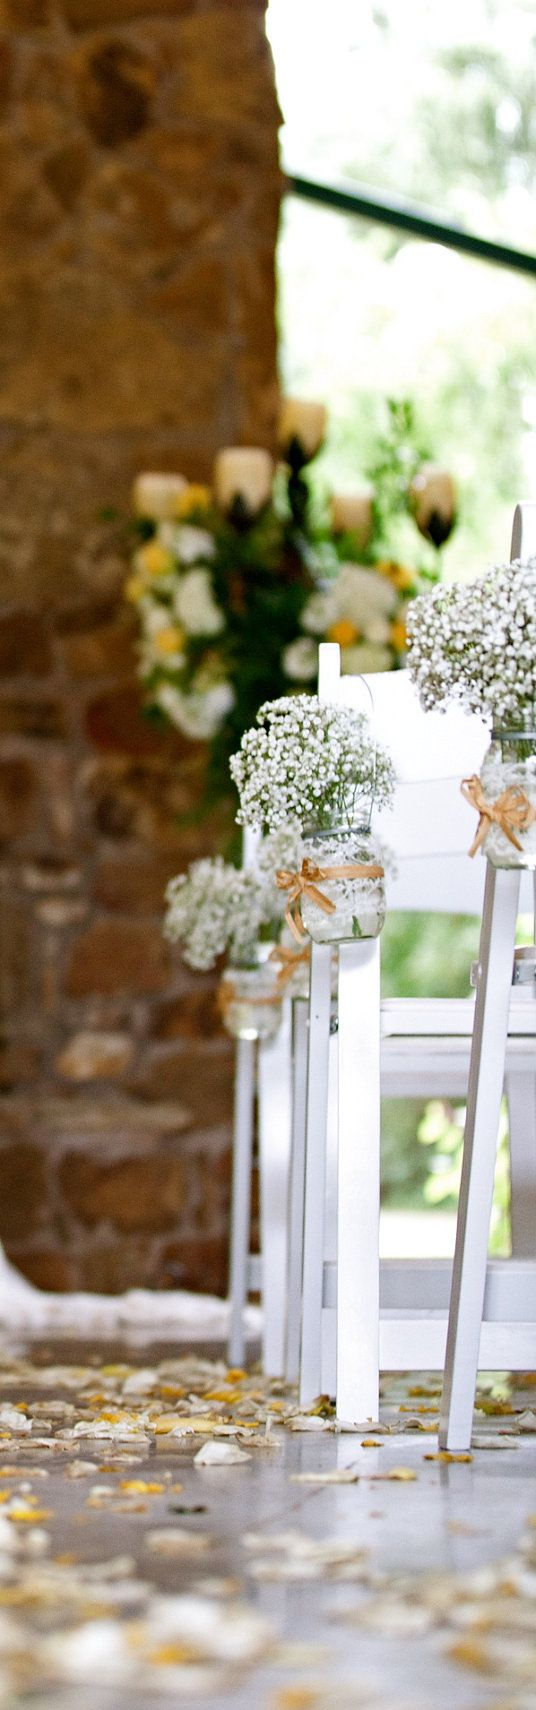 Set of 10 Vintage Inspired Mason Jar Vases for Wedding Ceremony Aisle, Vintage Rustic Wedding Decor